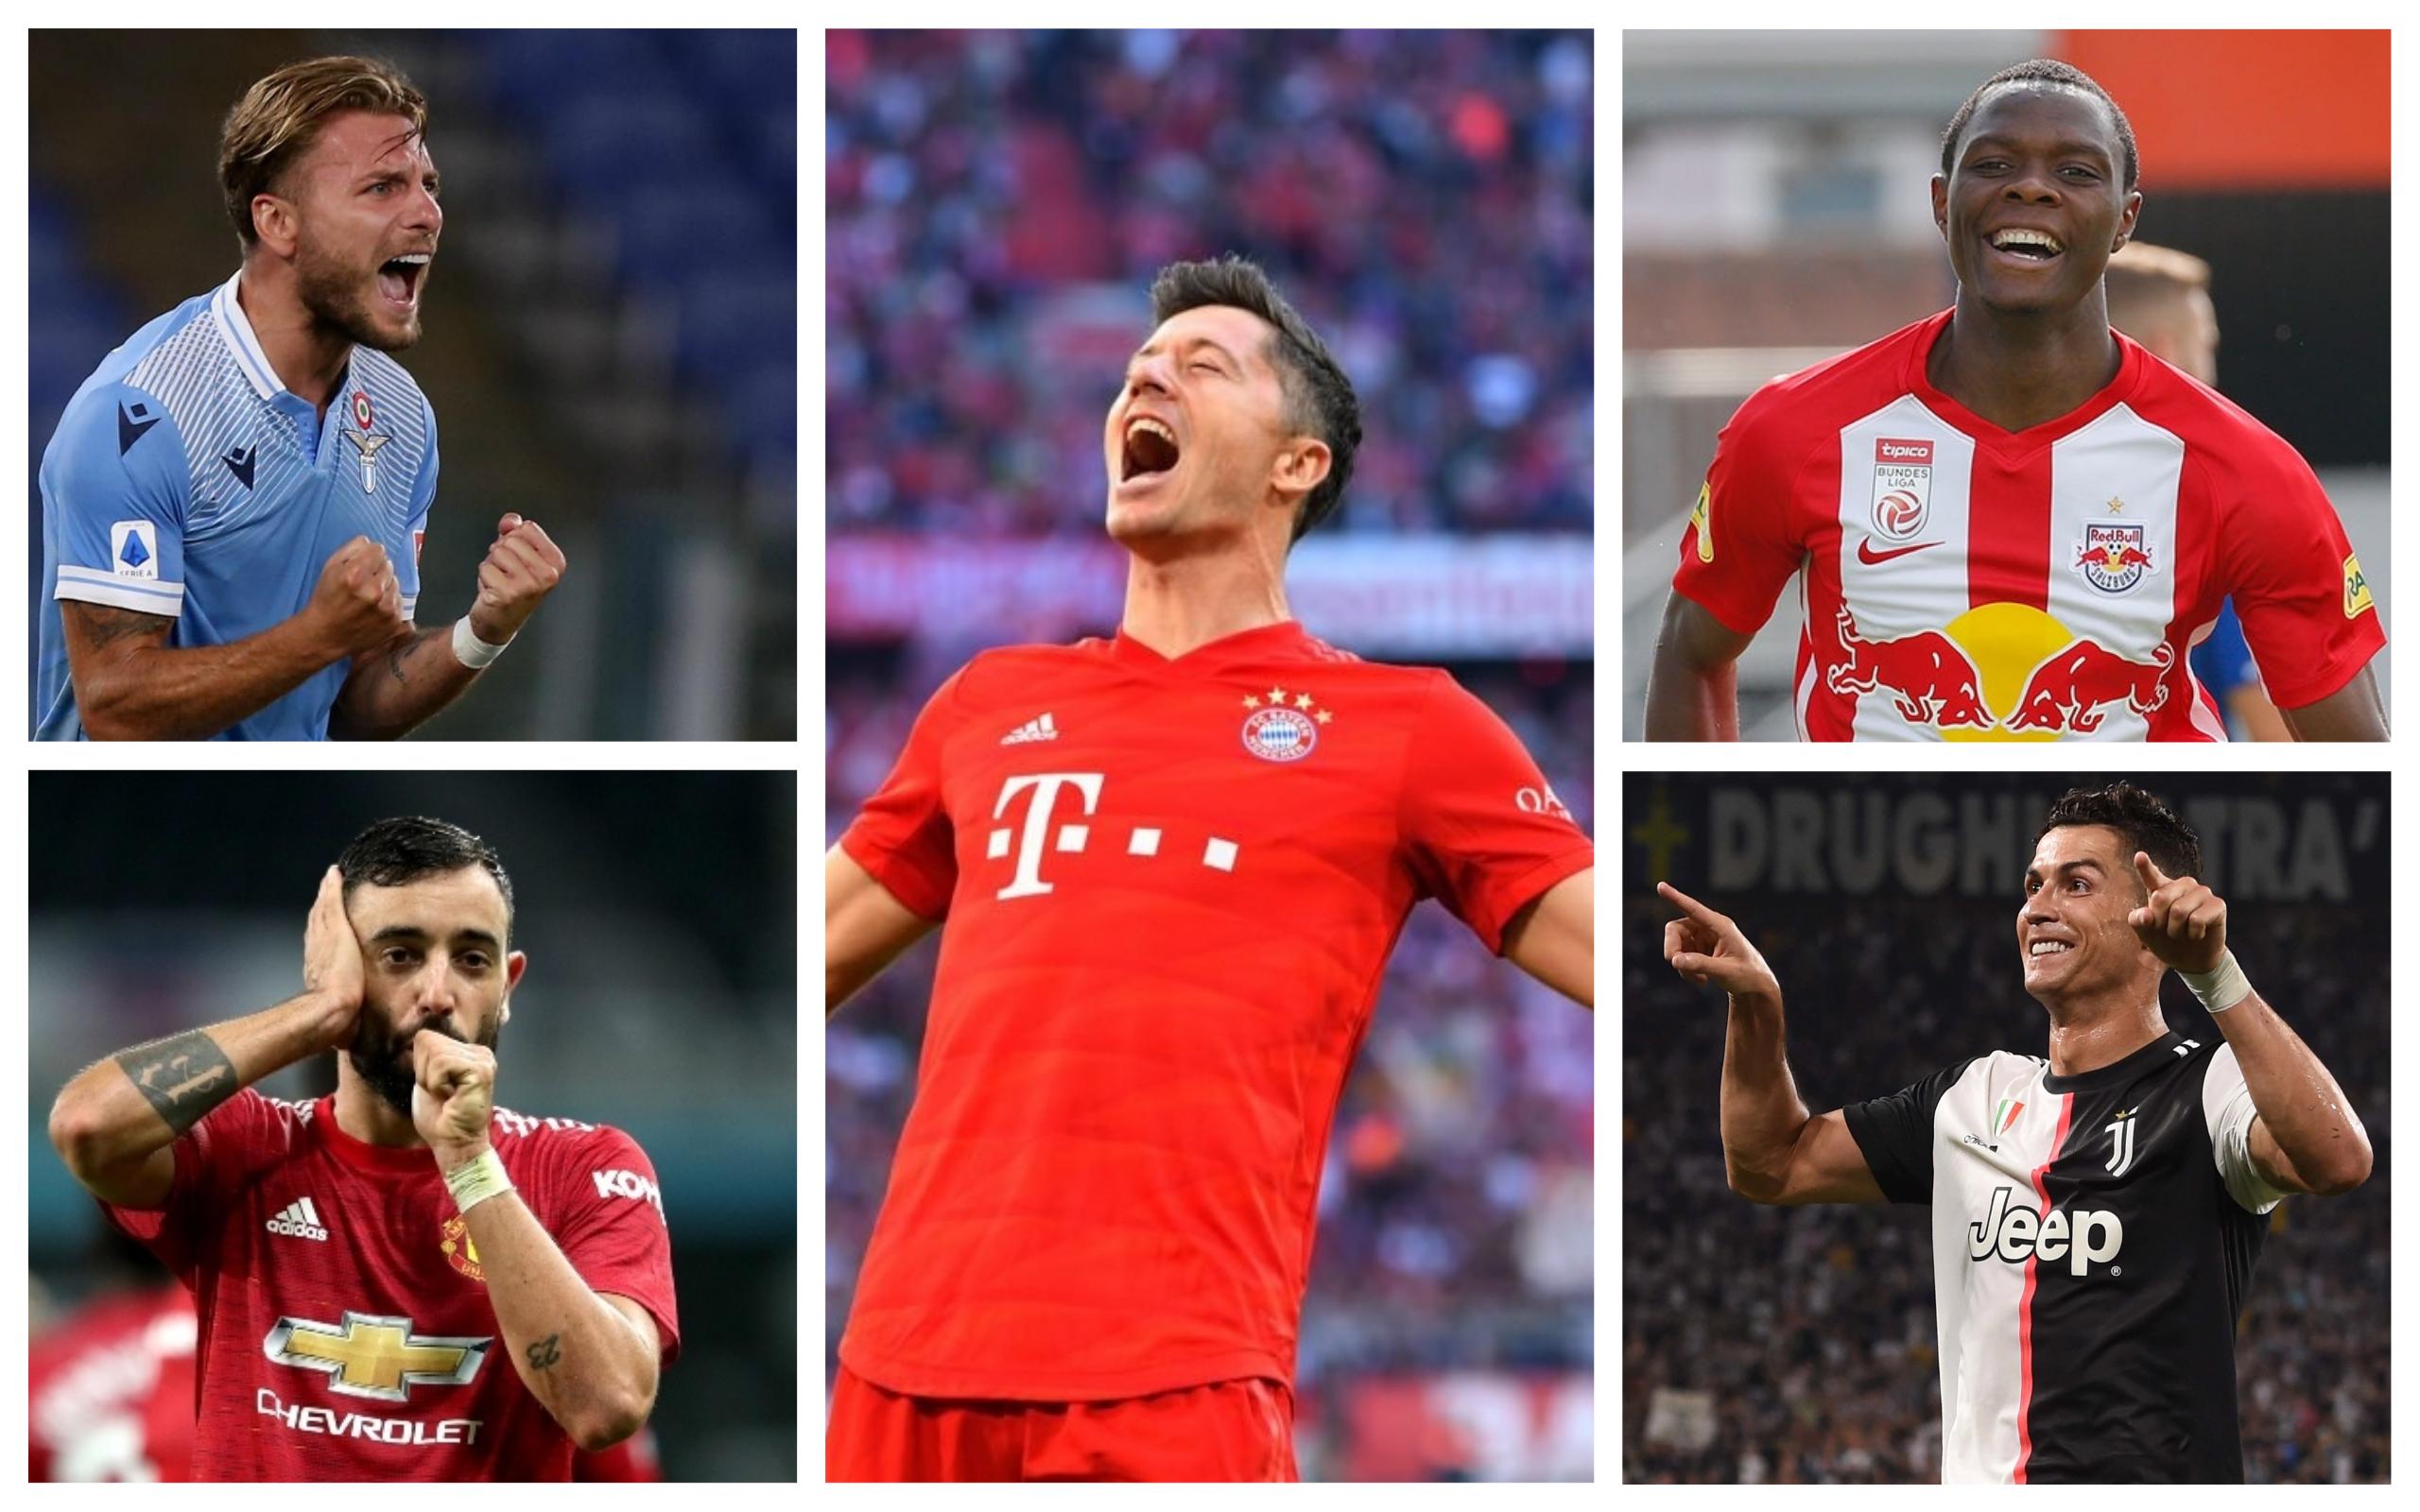 Top goalscorers of the 2019/2020 season